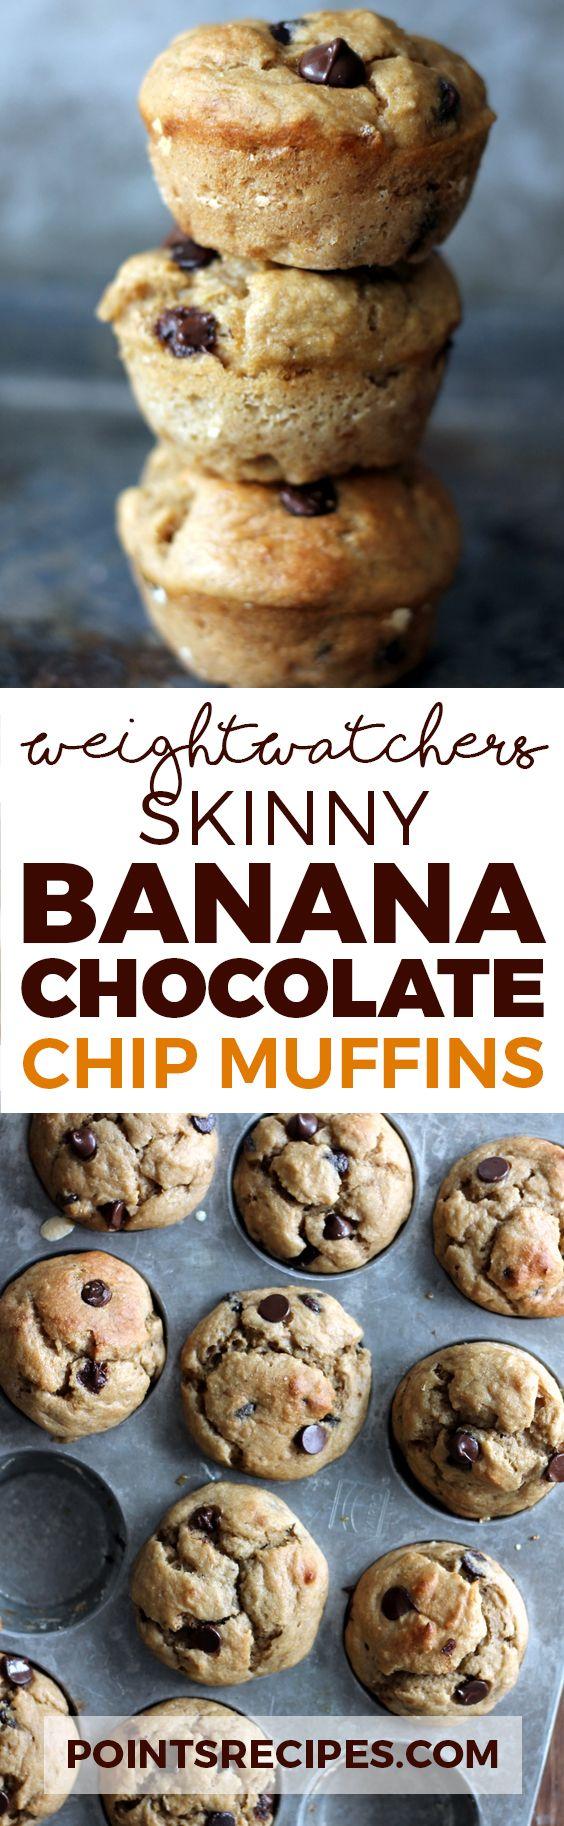 30 minute Skinny Banana Chocolate Chip Muffins (Weight Watchers SmartPoints)